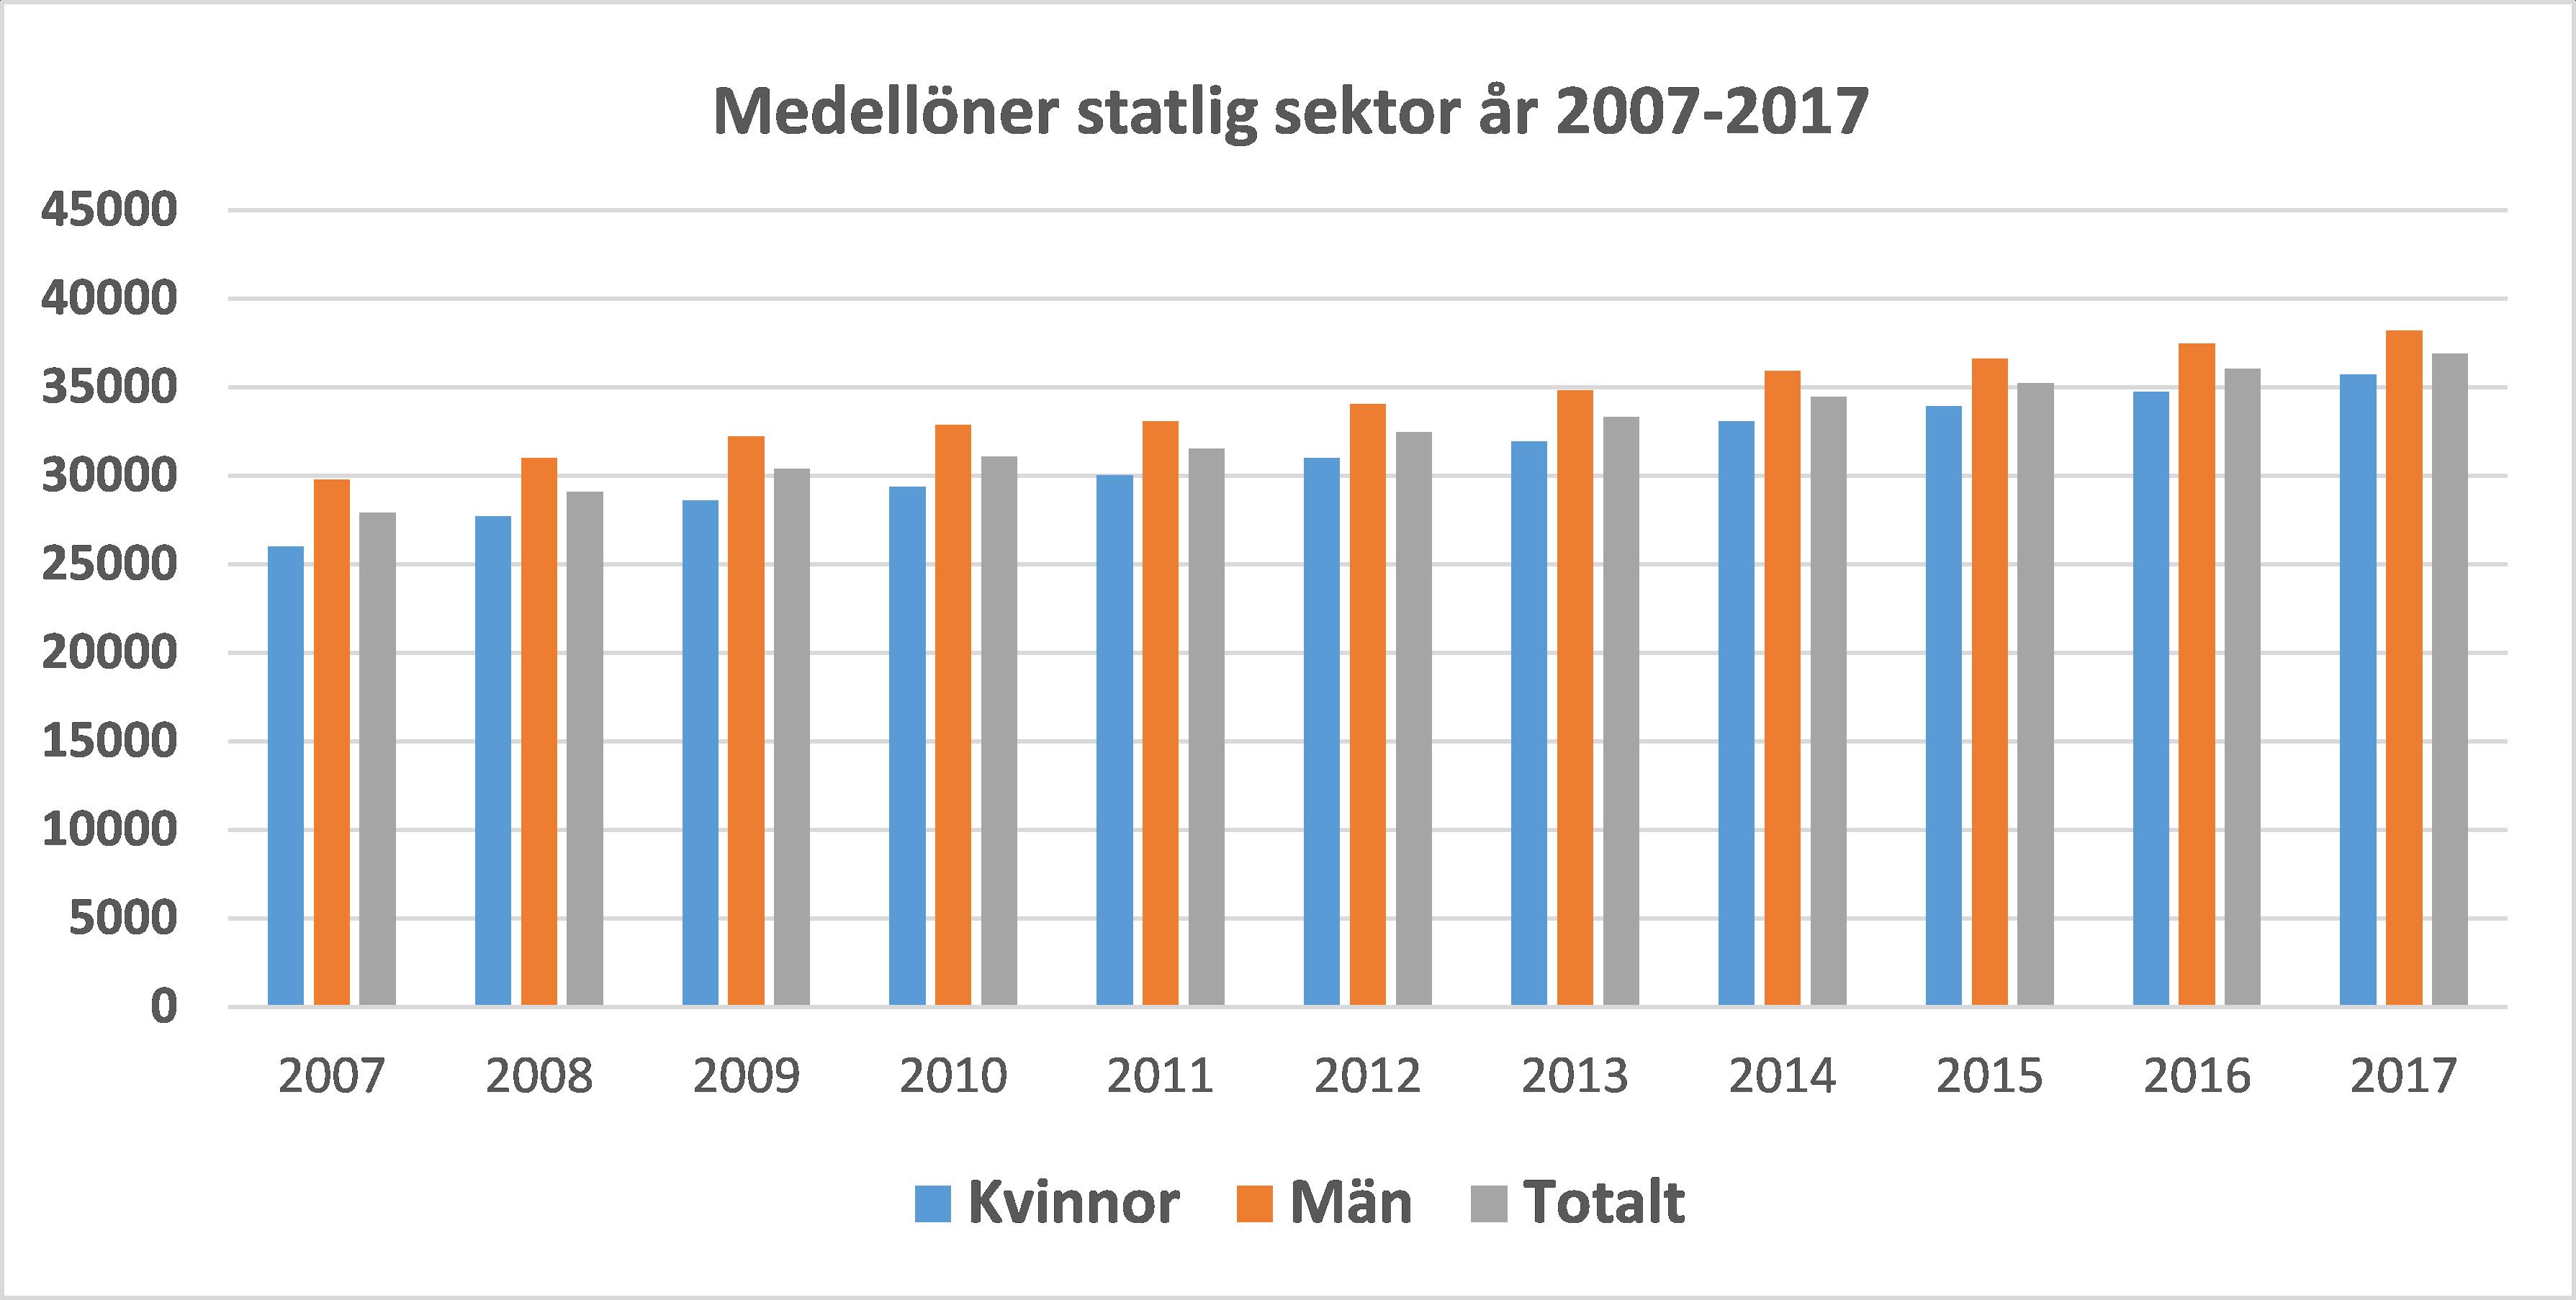 löneökning procent 2017